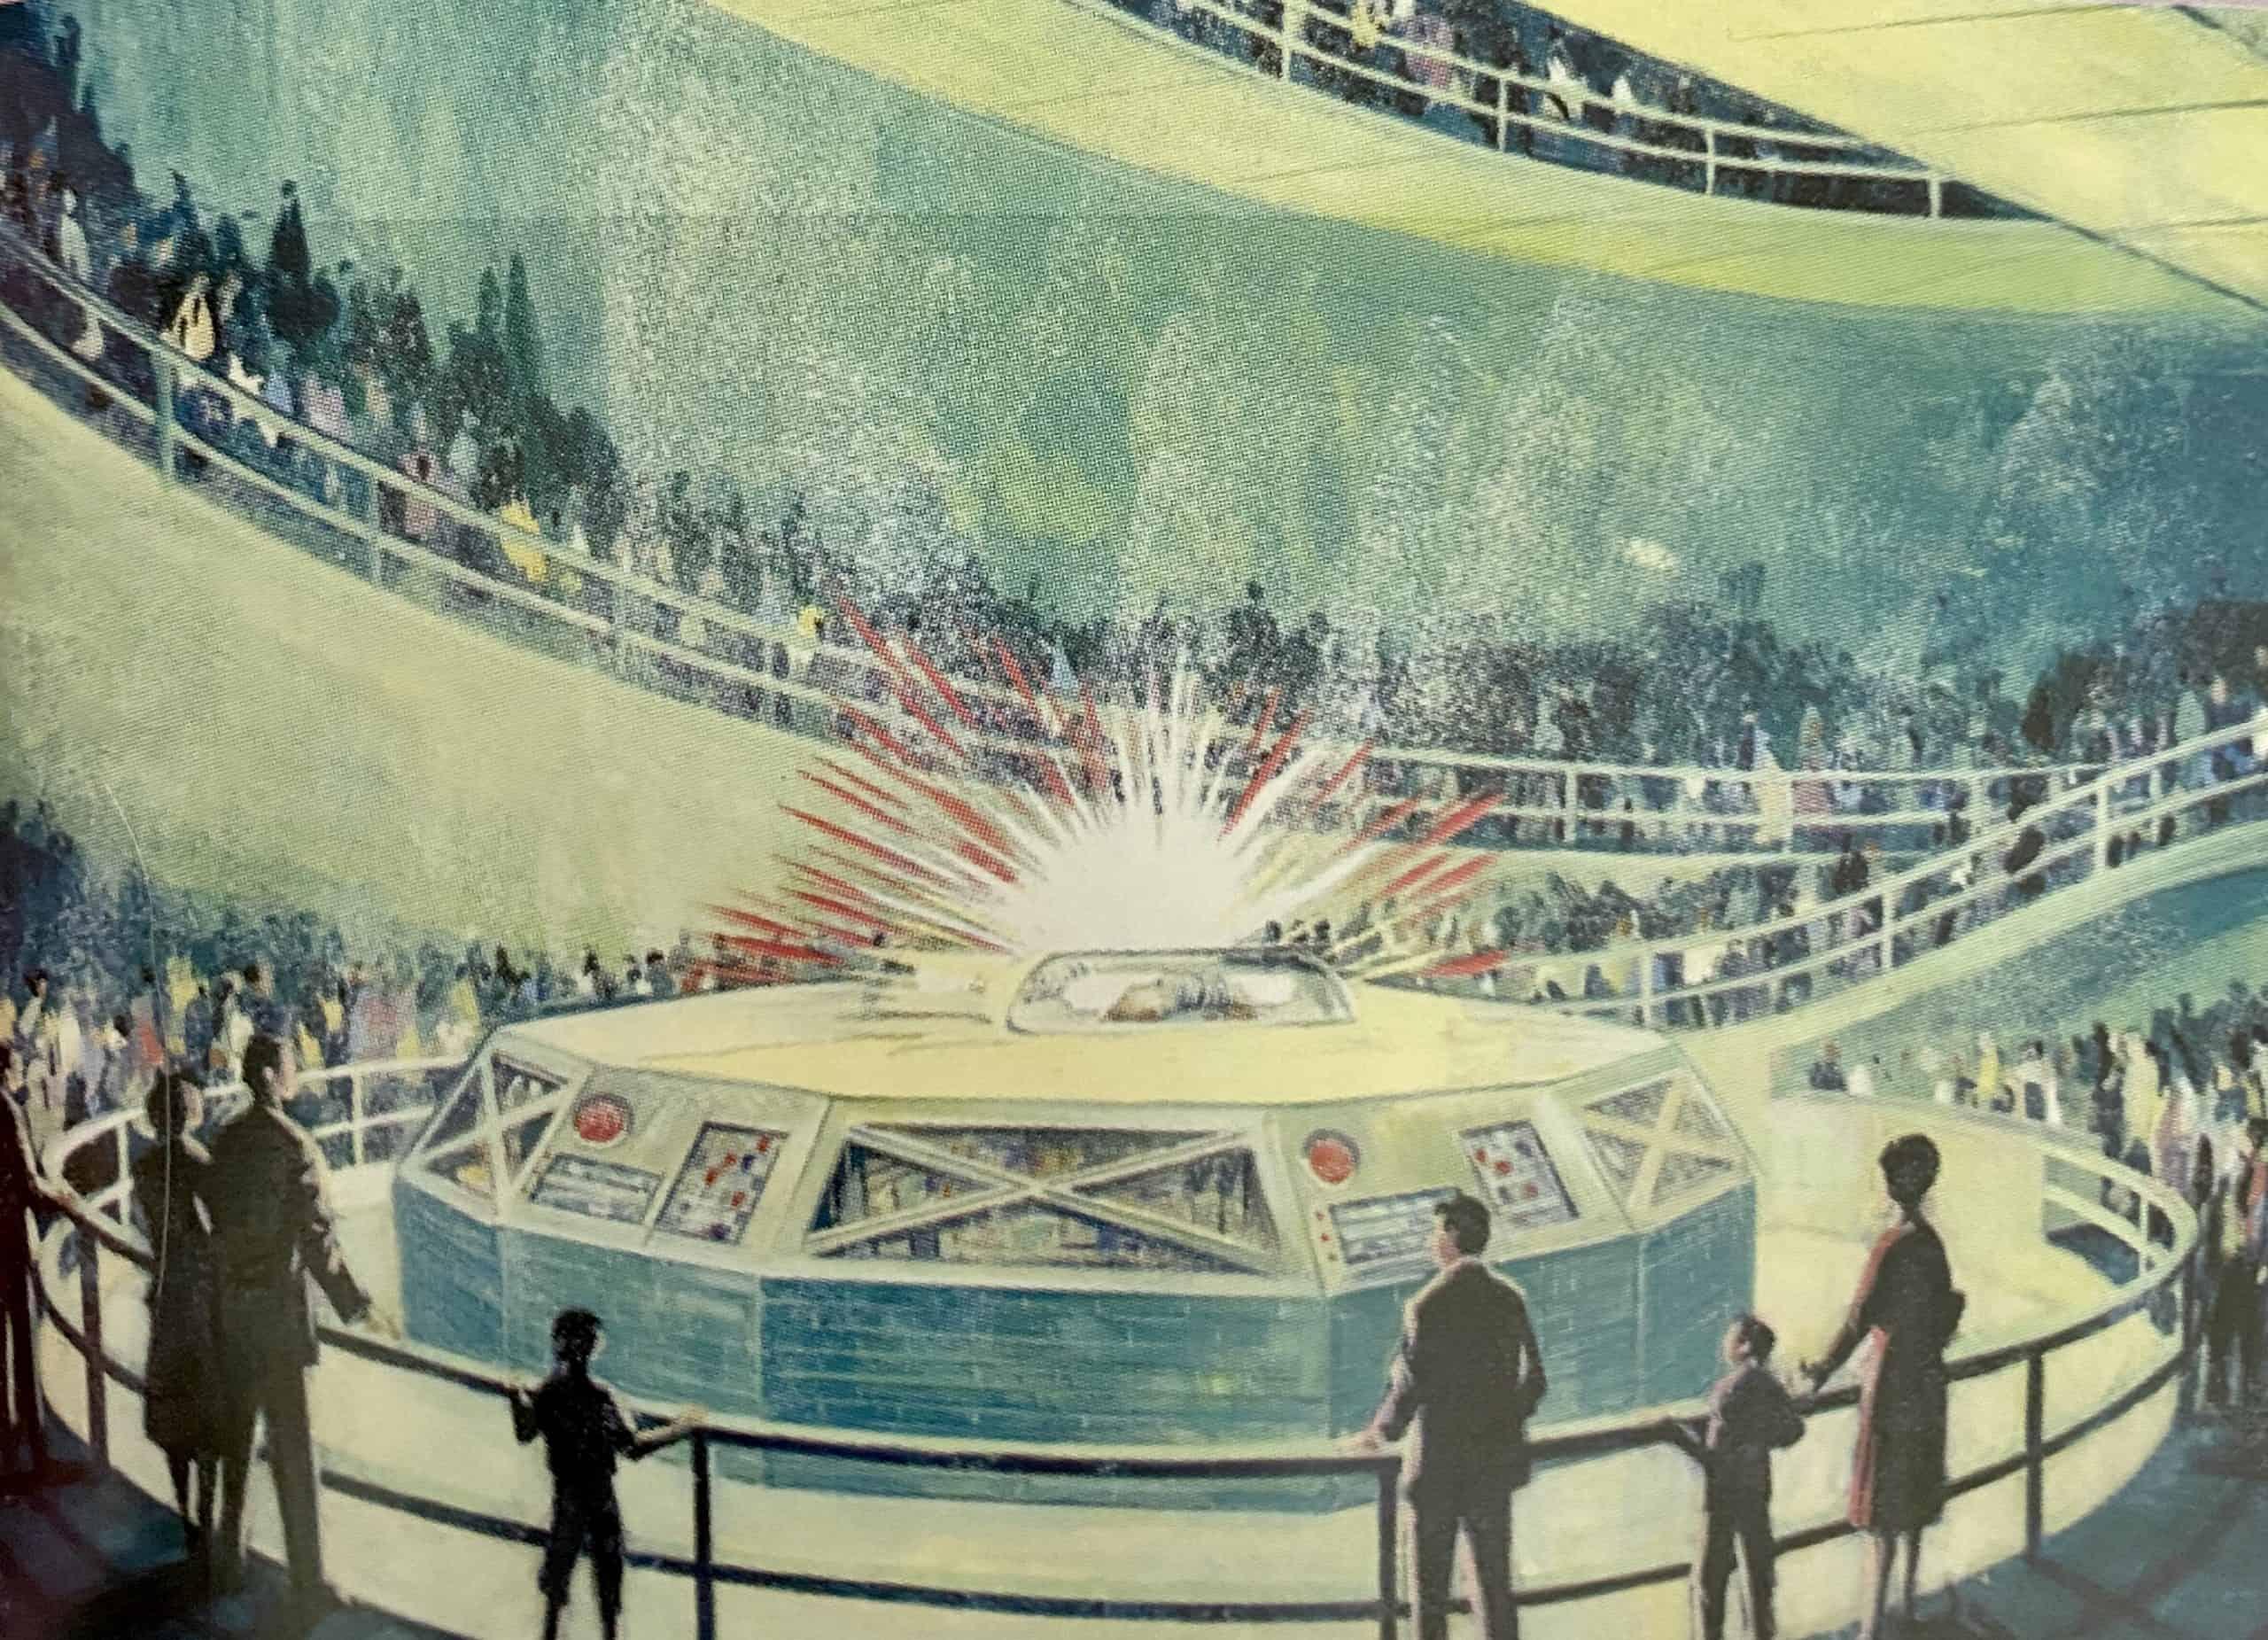 Progressland concept art